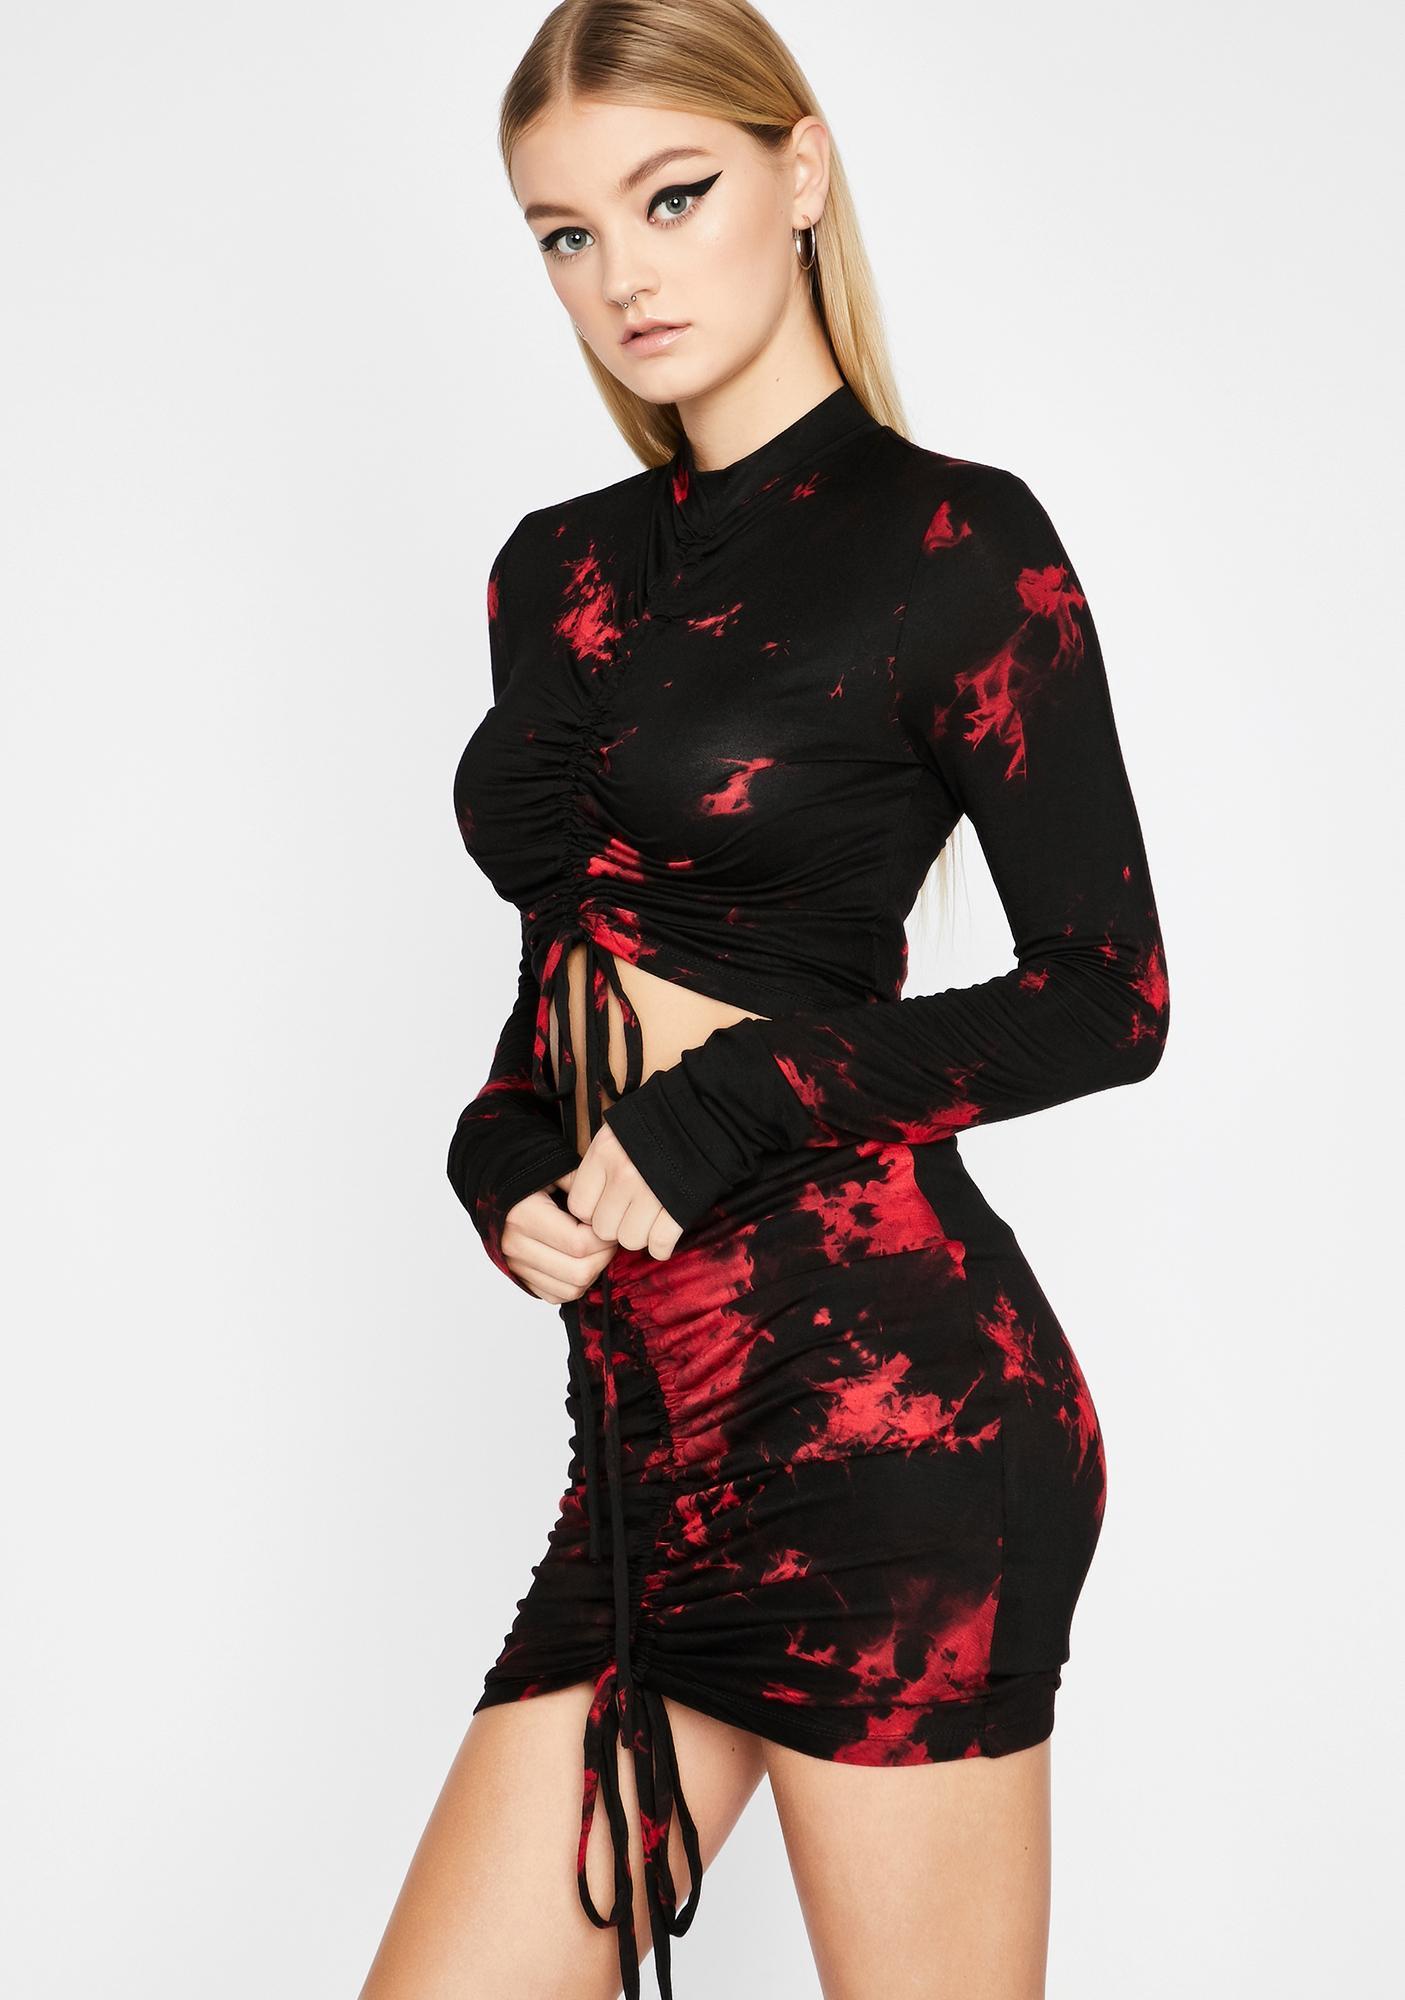 Twisted Fling Ruched Skirt Set